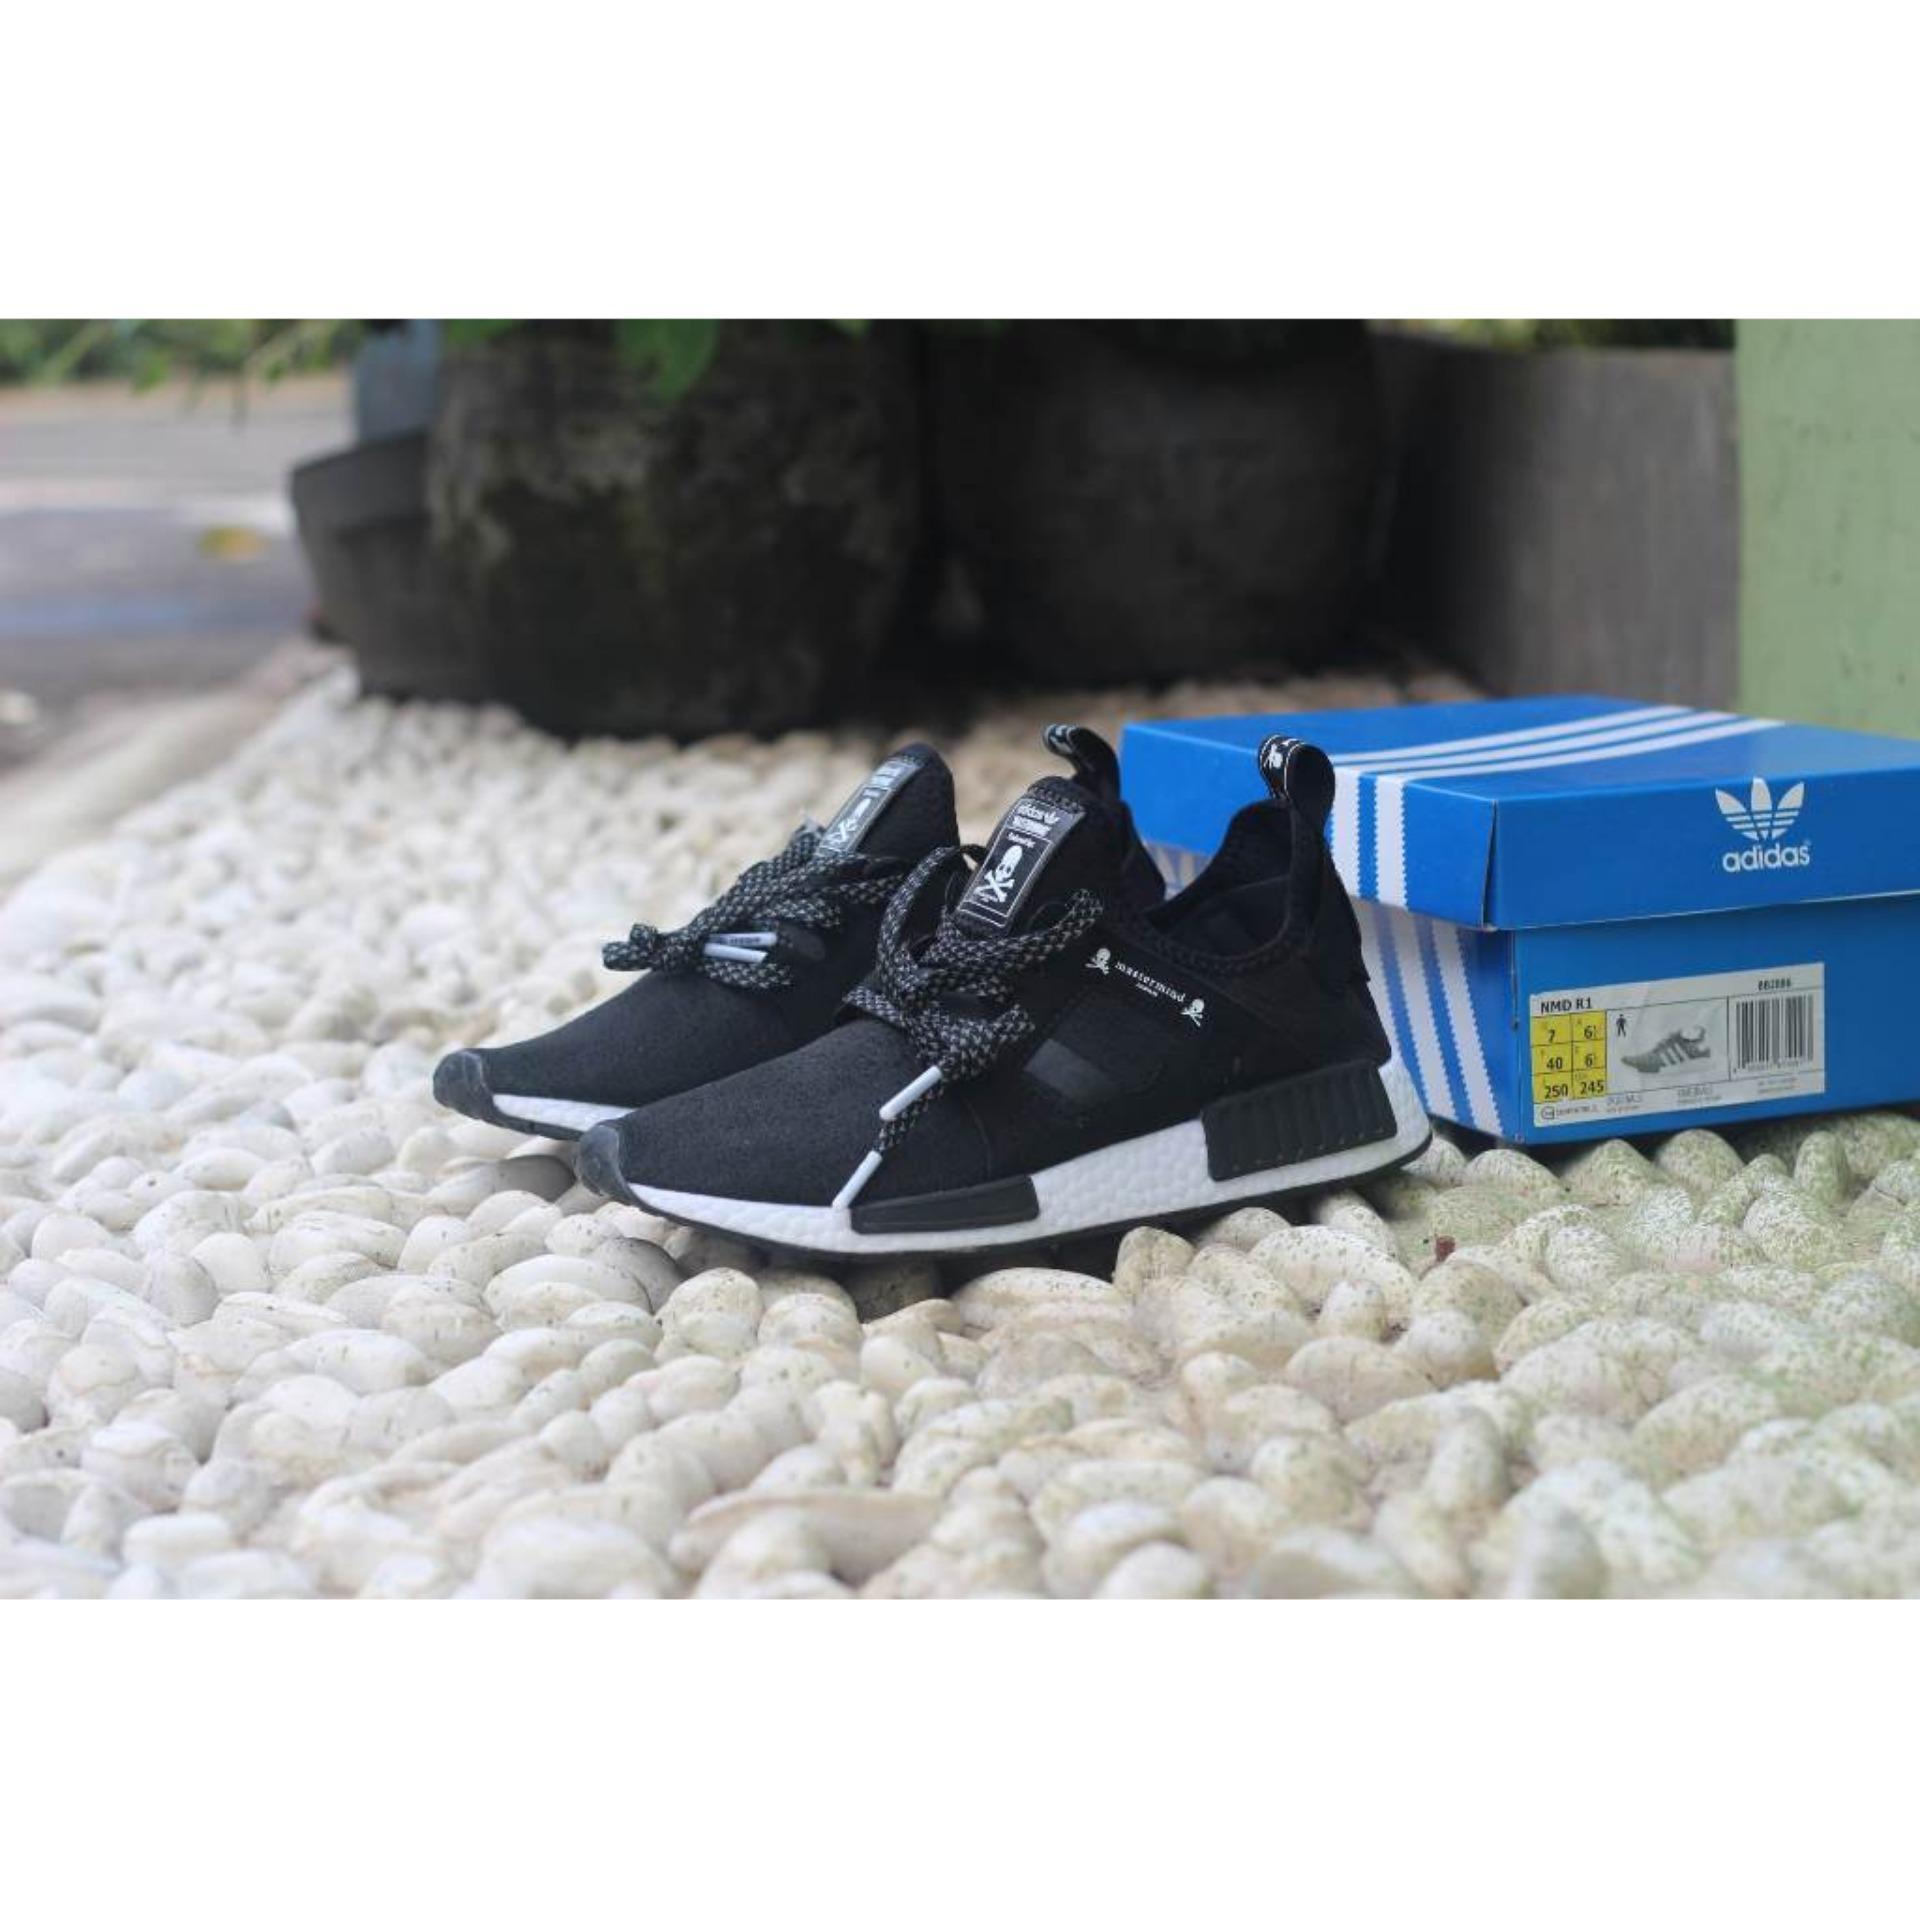 Sepatu Adidas NMD Tokyo Premium 0400 5